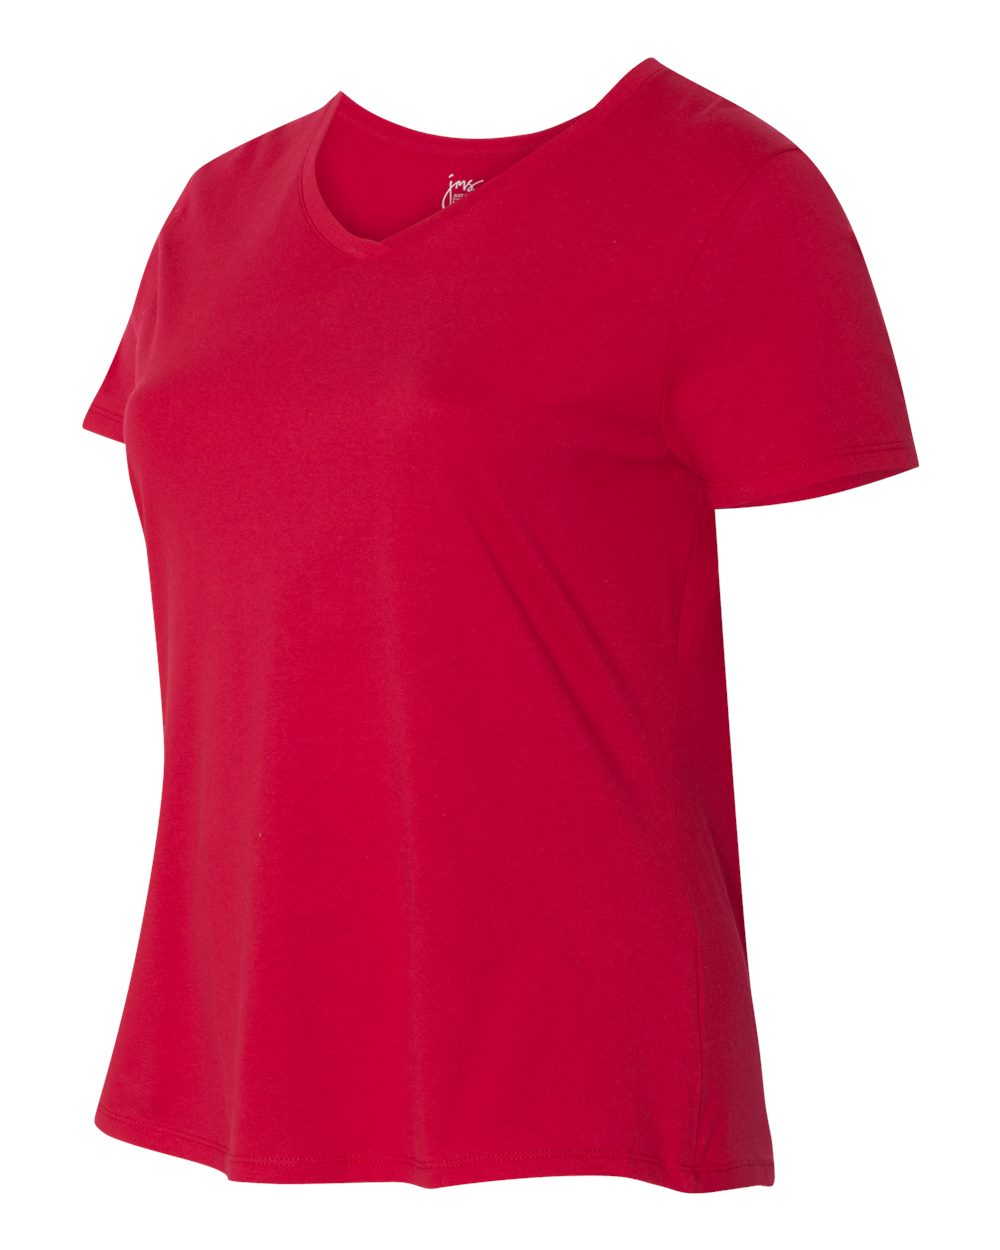 Hanes JMS20 - Just My Size Women's Short Sleeve Tee